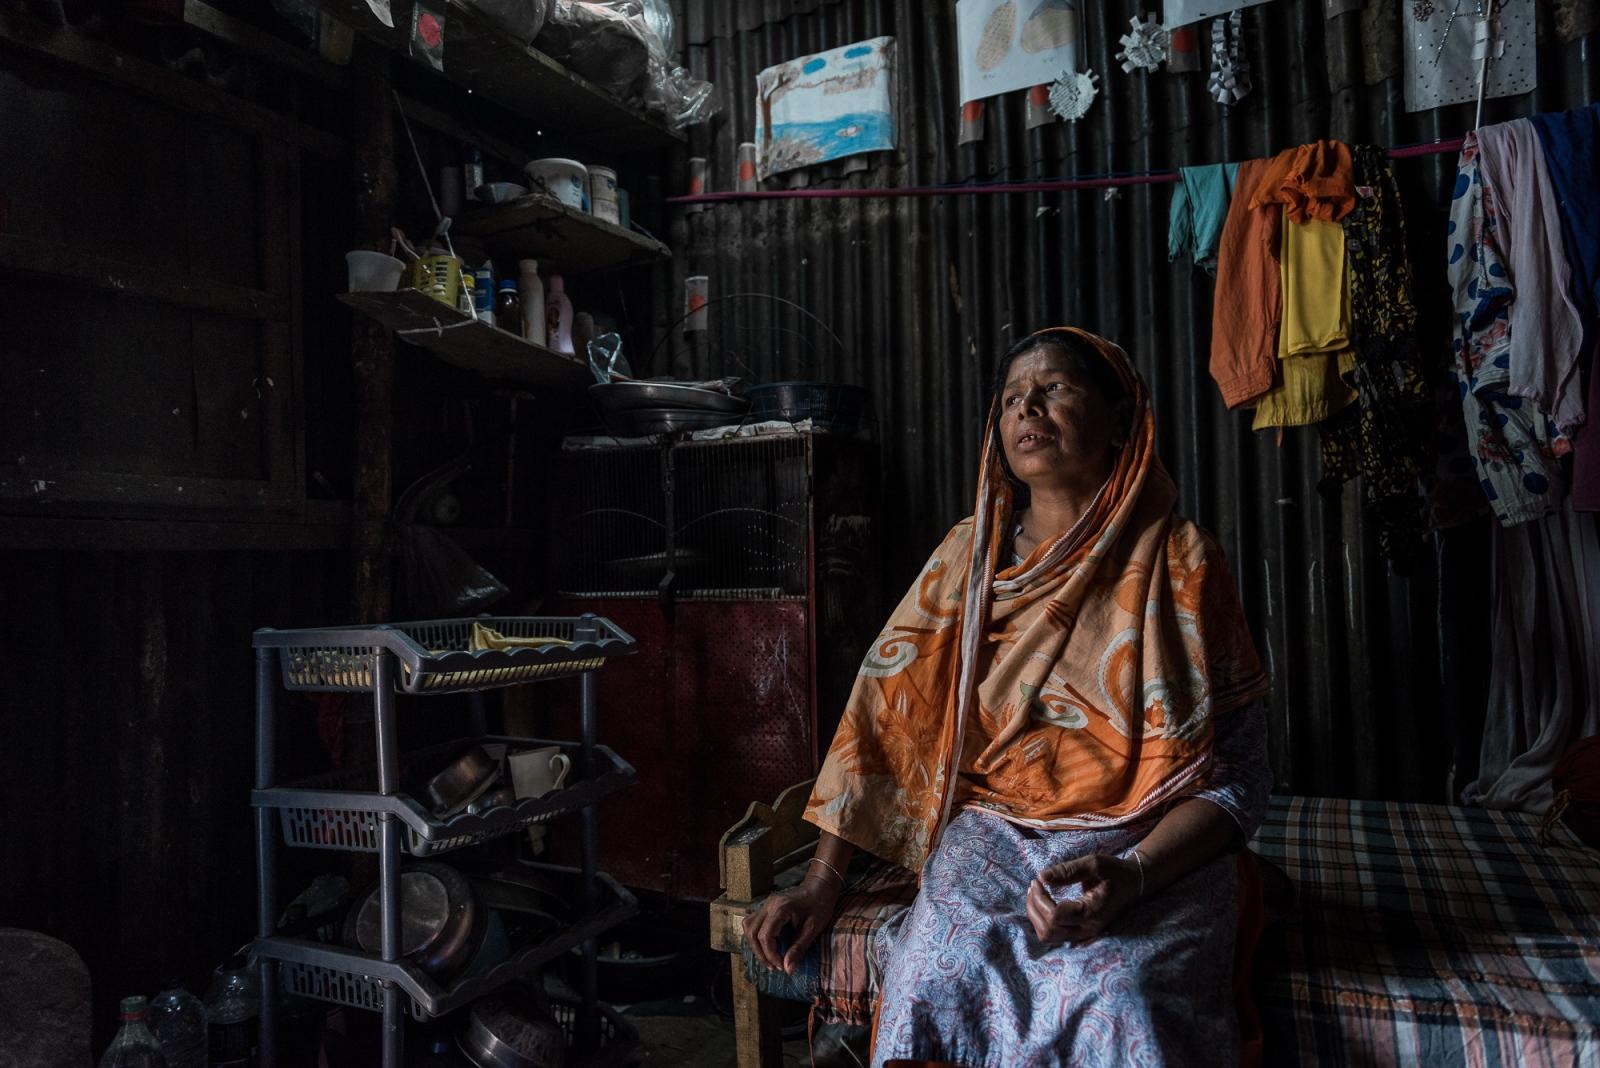 Art and Documentary Photography - Loading Climate_changed_-_Ignacio_Marin-15.jpg